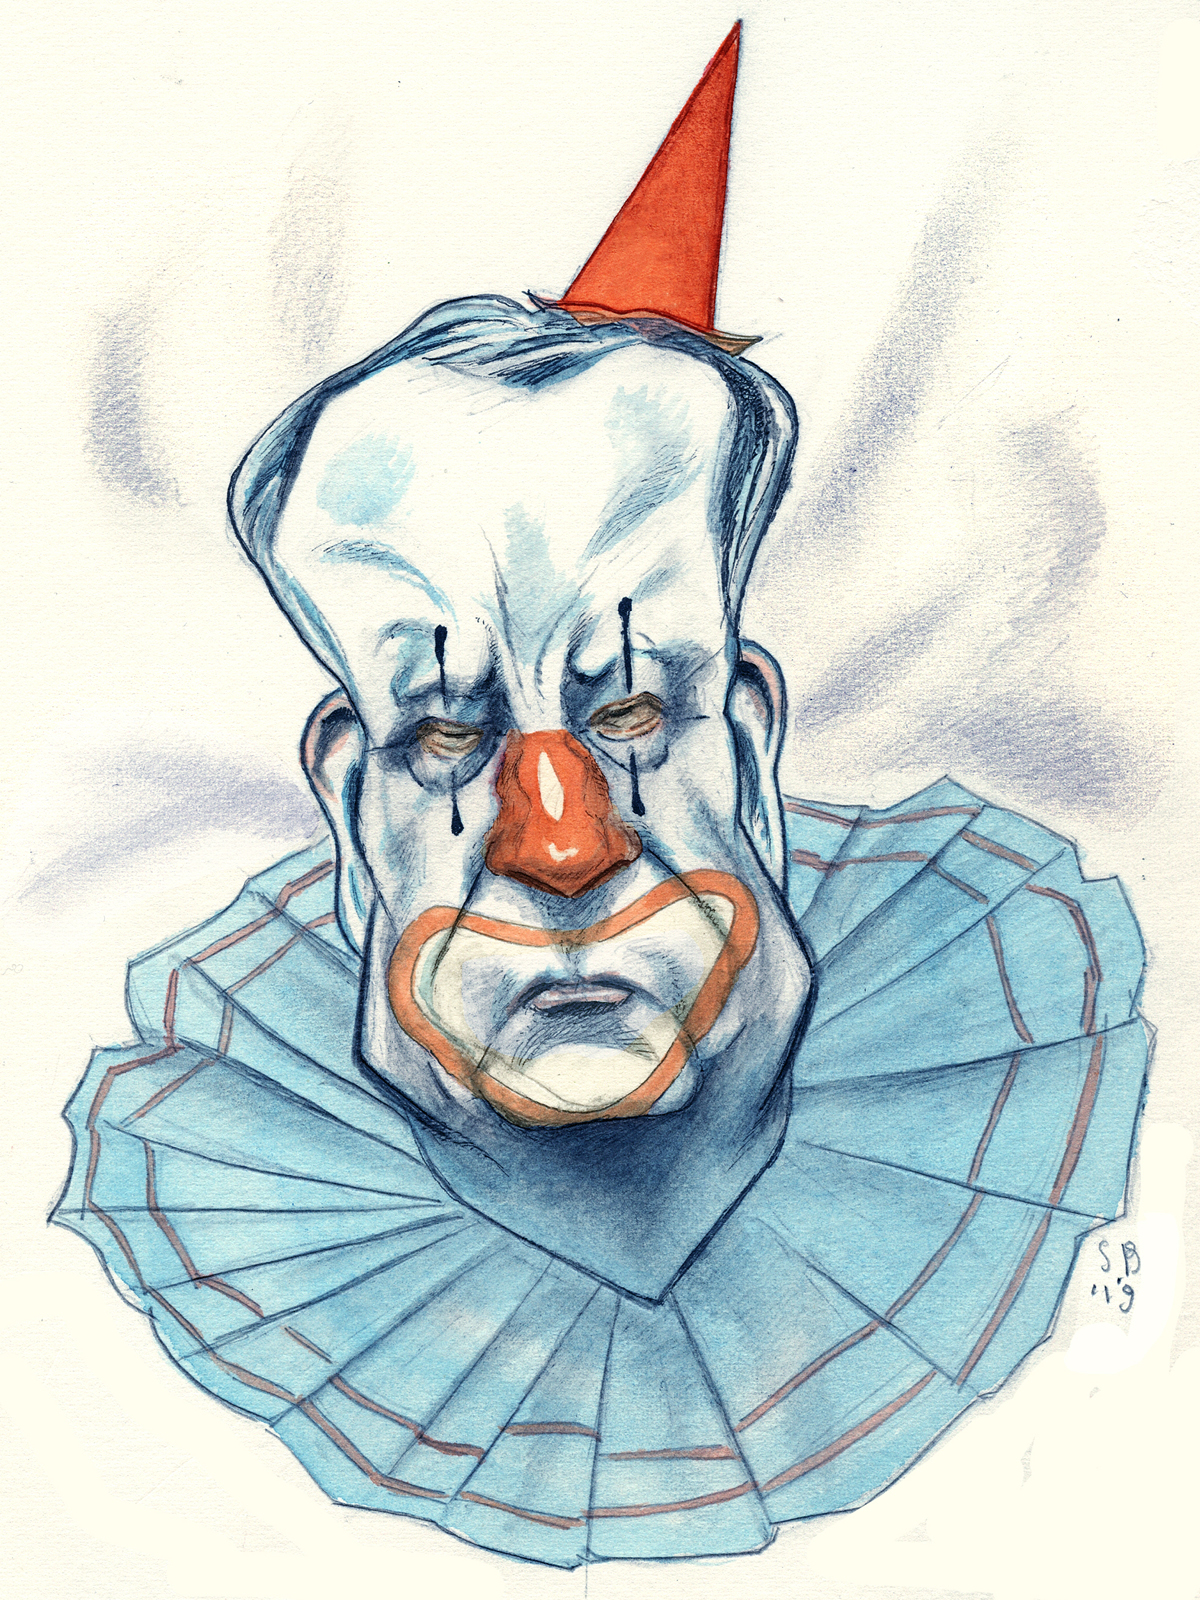 newrepublic.com - Clio Chang - Why Is Bill de Blasio's Presidential Dream a Sad Joke?